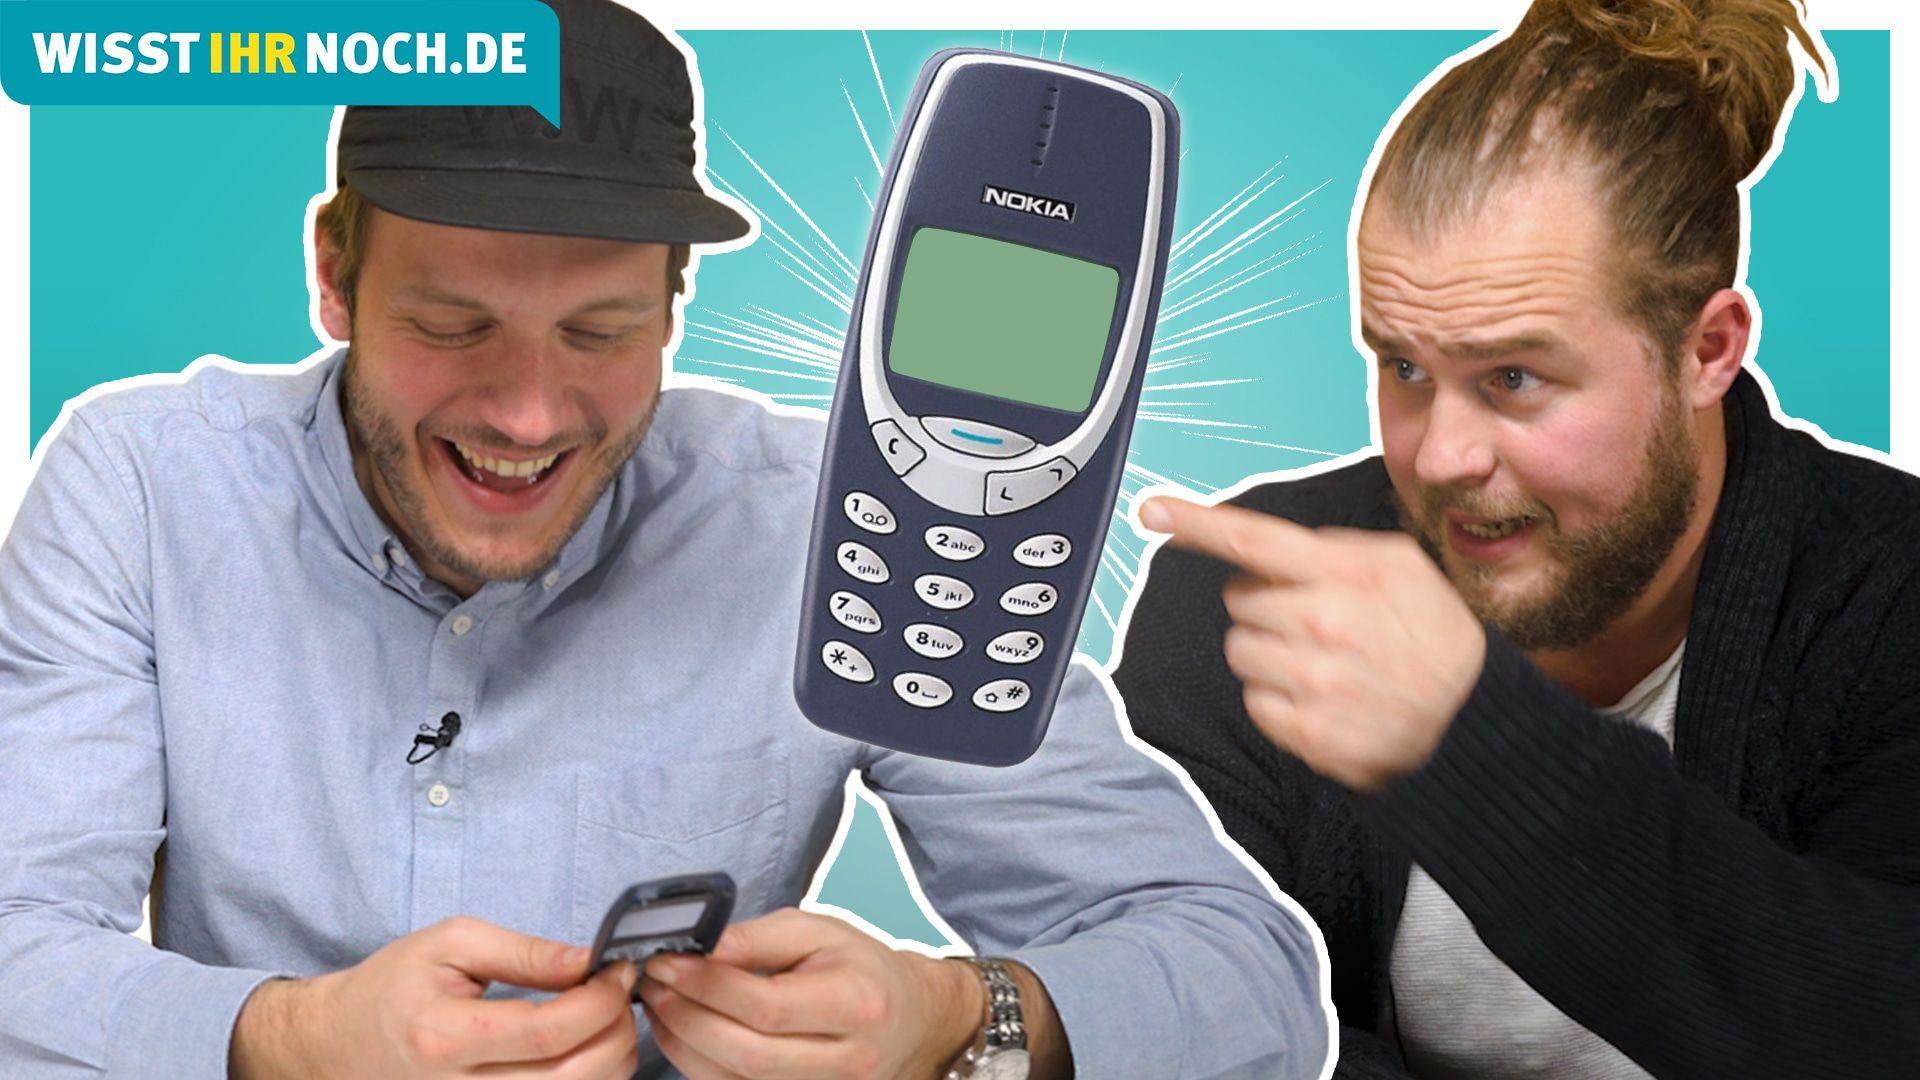 Bild_Thumbnail_reactions_S01_E09_Nokia_Kempf